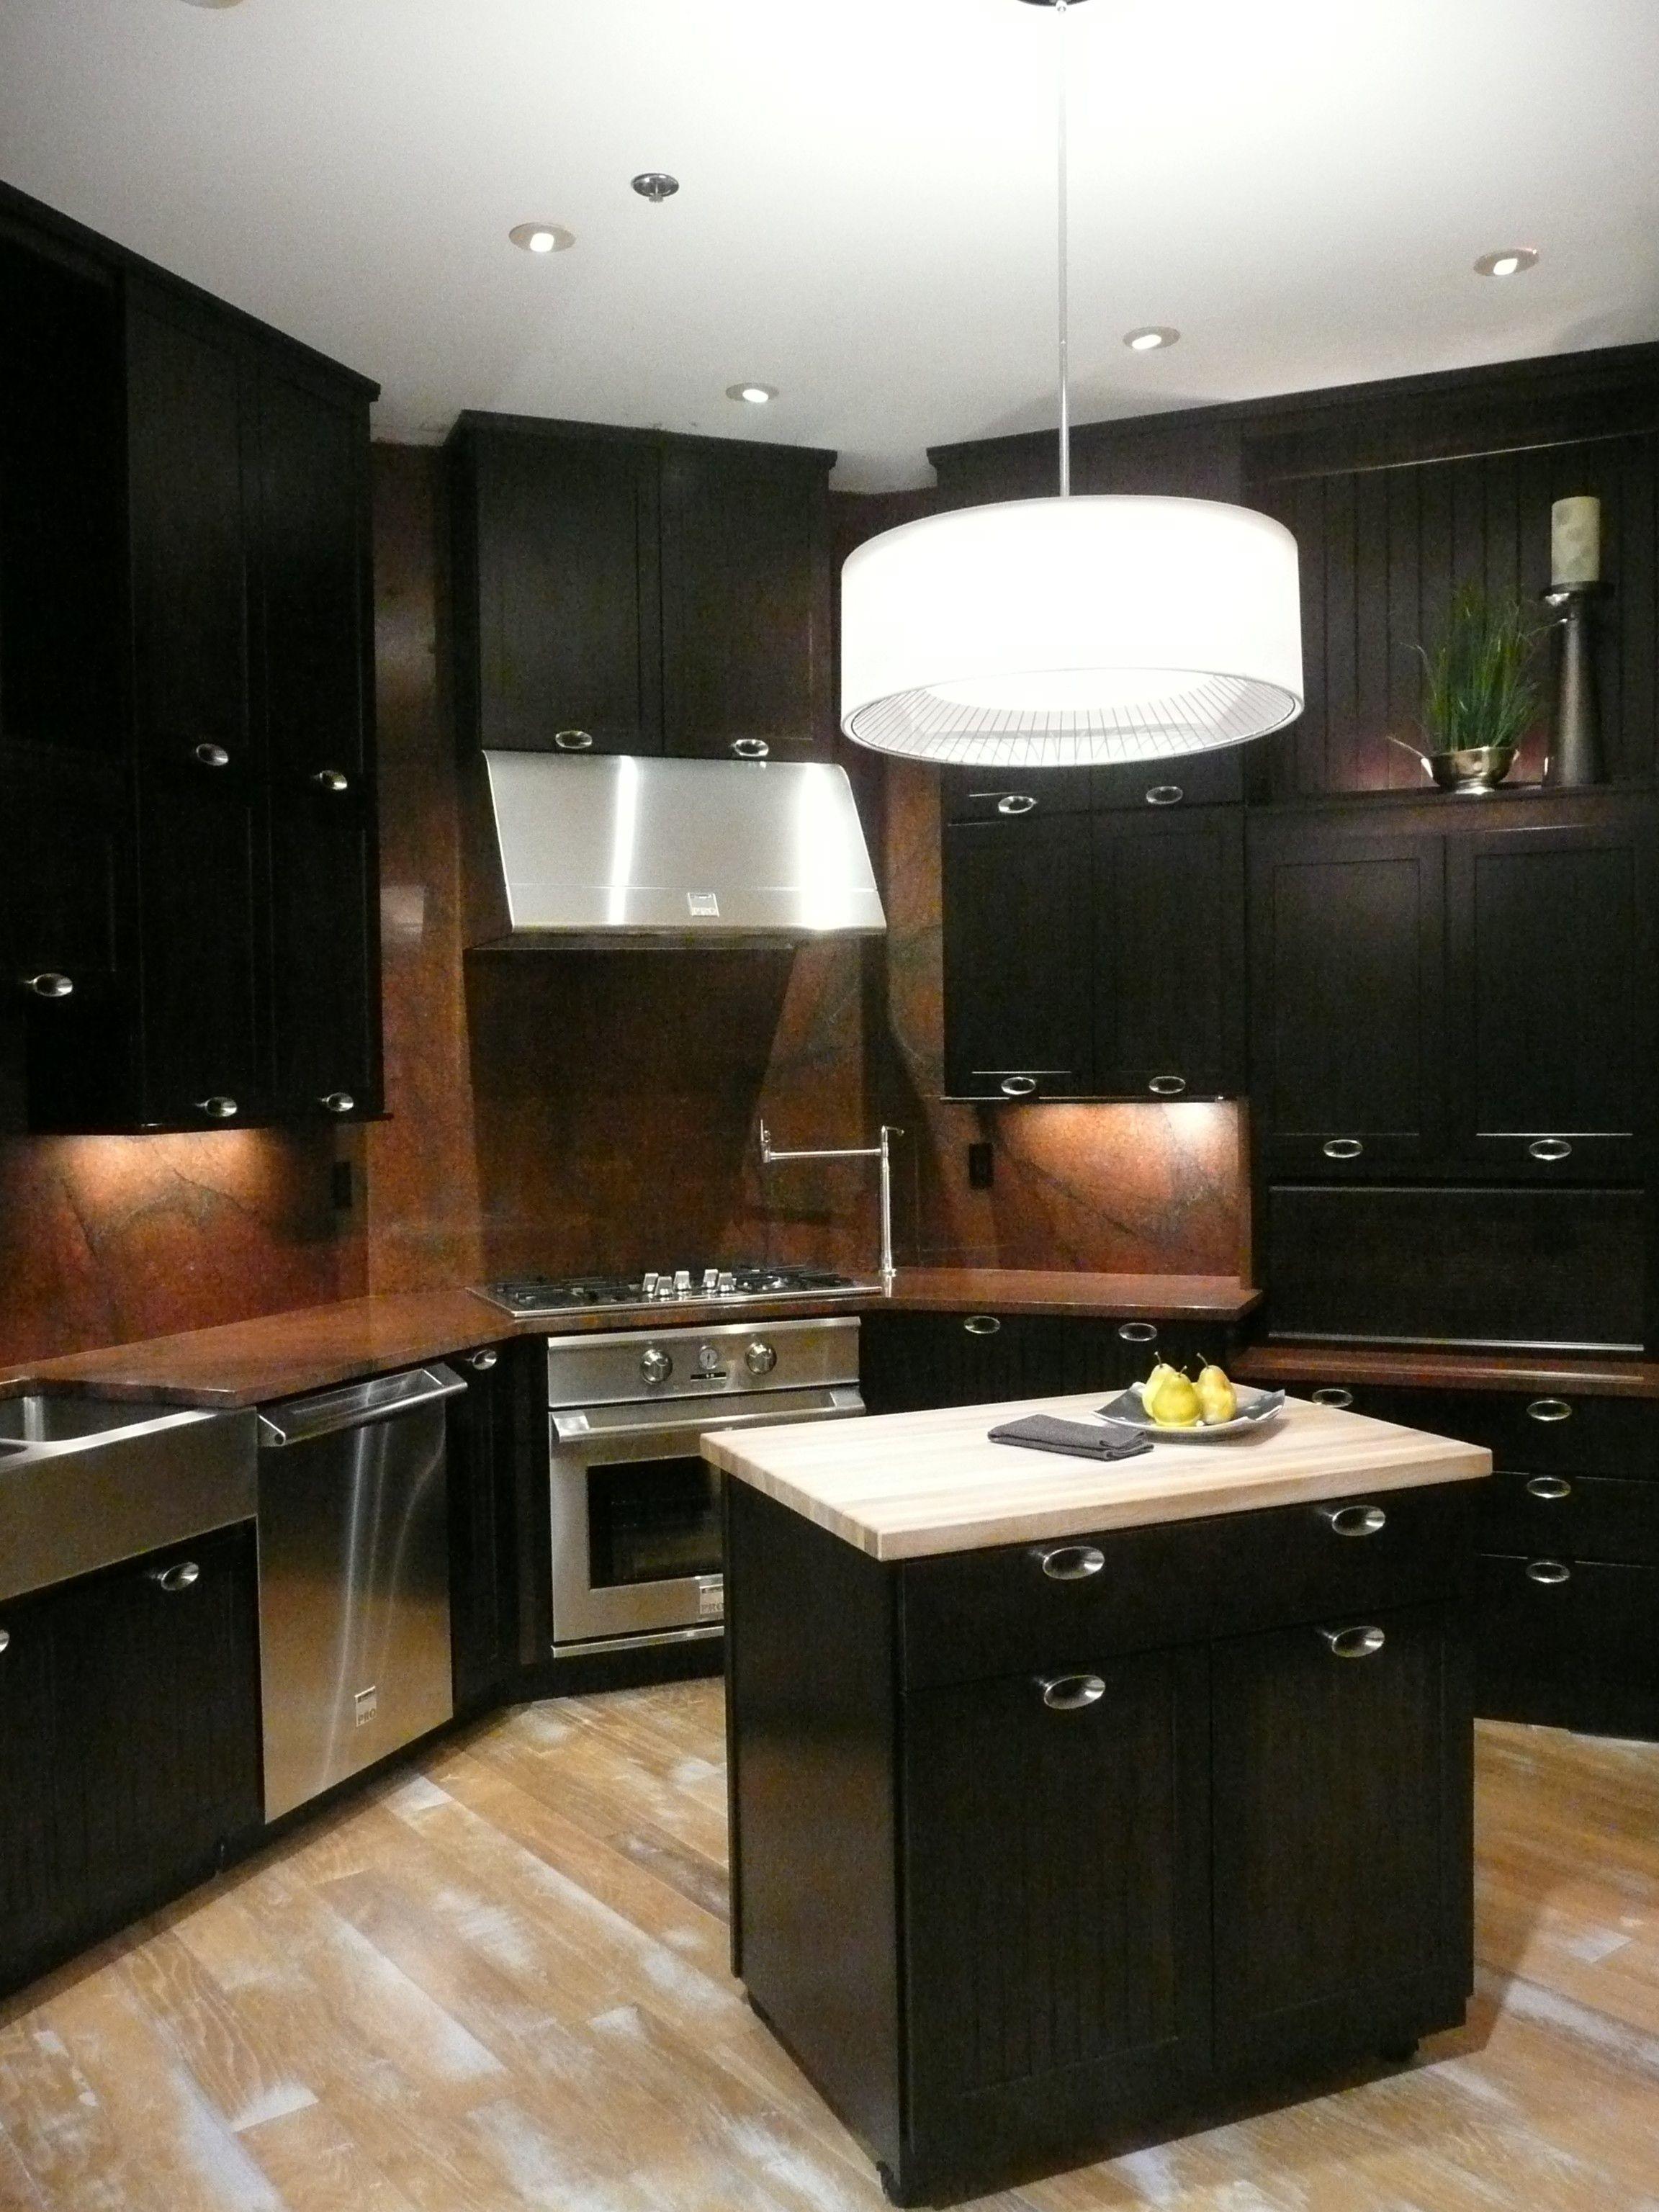 Red Dragon Kitchen By Shylo With Images Black Kitchens Modern Kitchen Kitchen